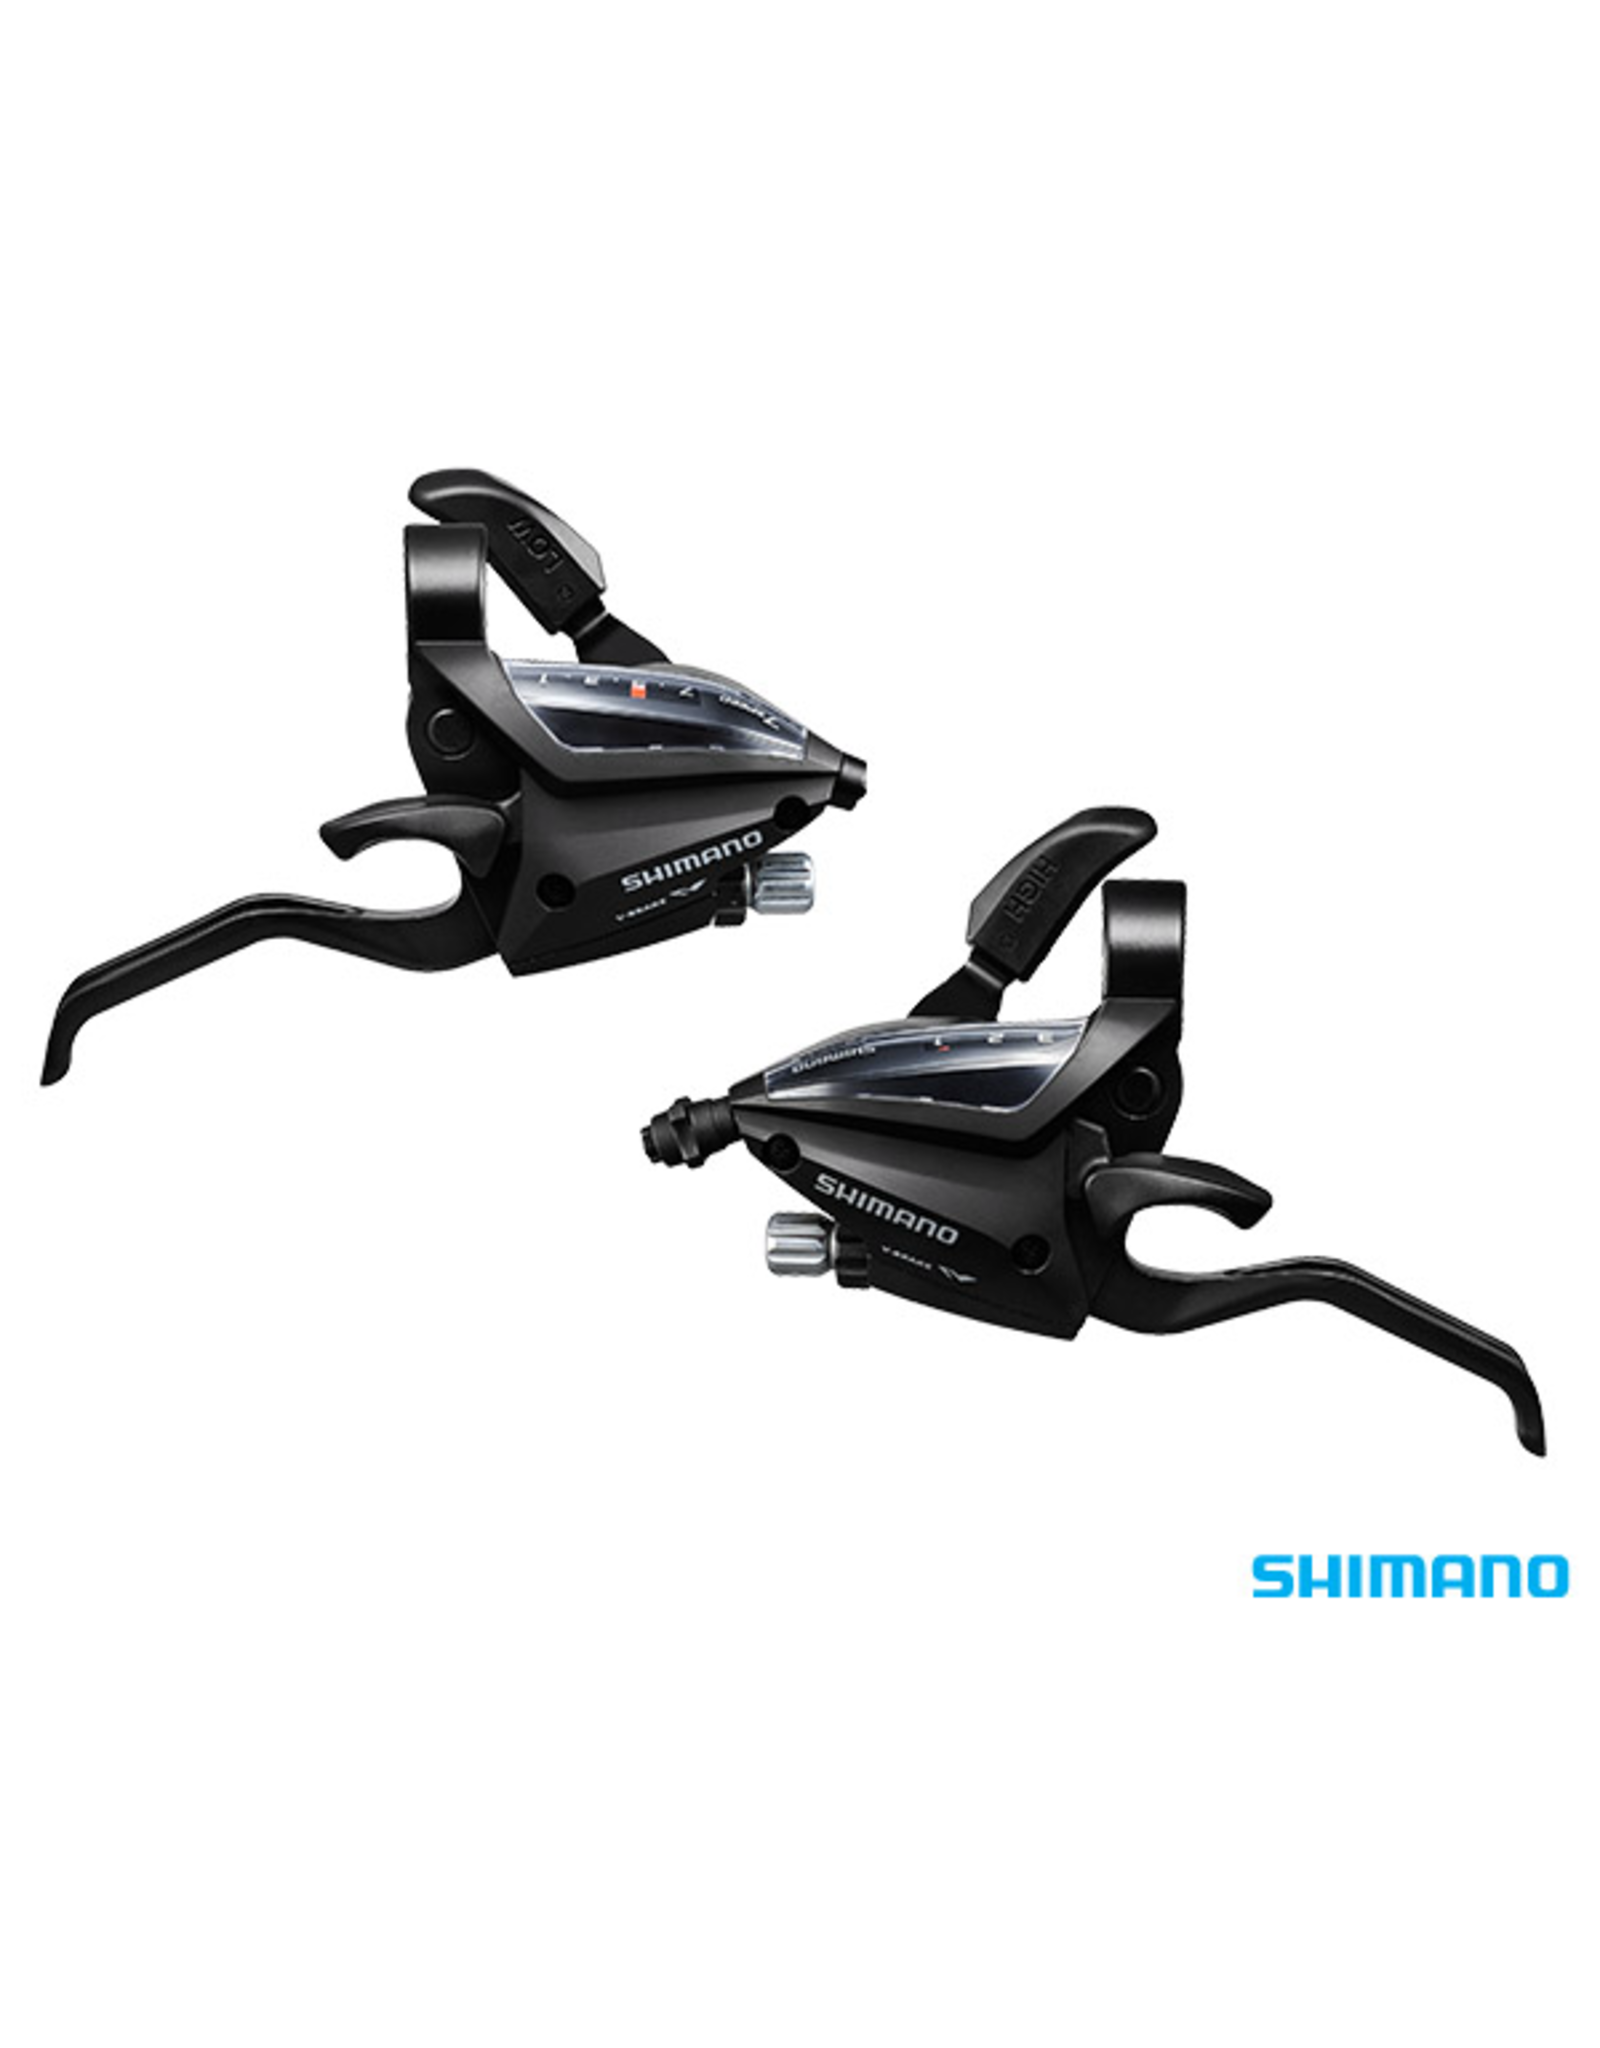 SHIMANO ST-EF500 STI set, 2-finger lever, 3 x 7